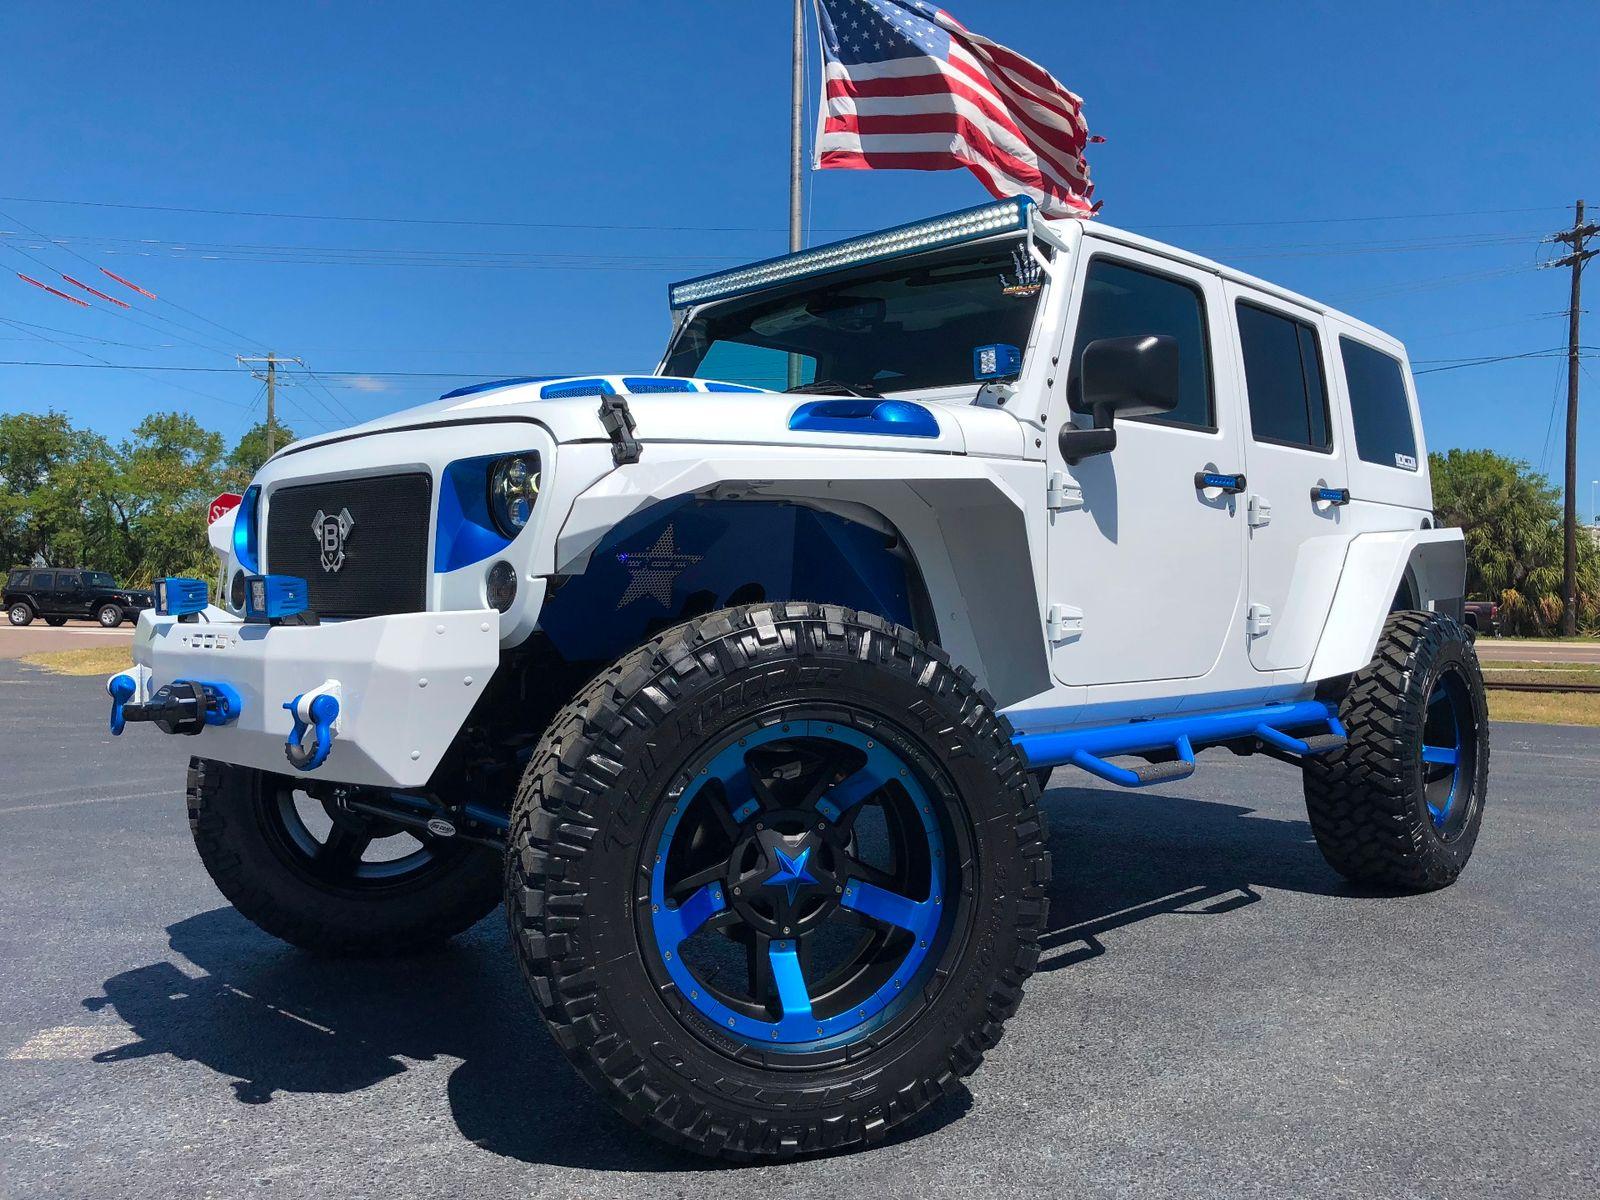 2018 Jeep Wrangler Jk Unlimited Custom White N Blue Lifted